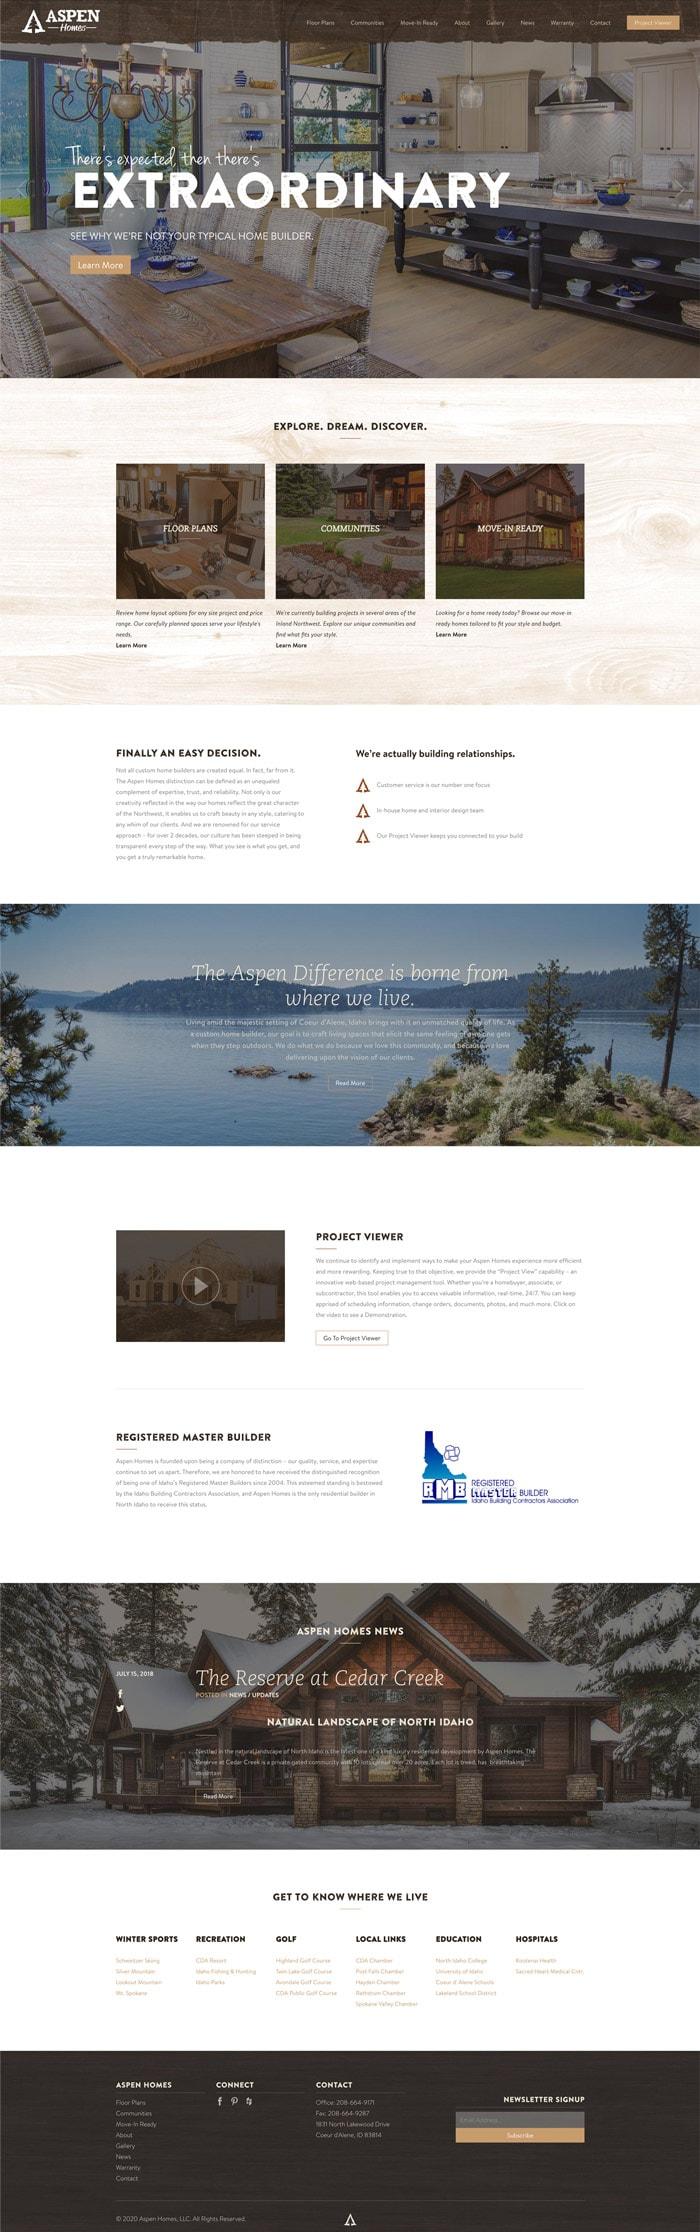 Aspen Homes website mockup